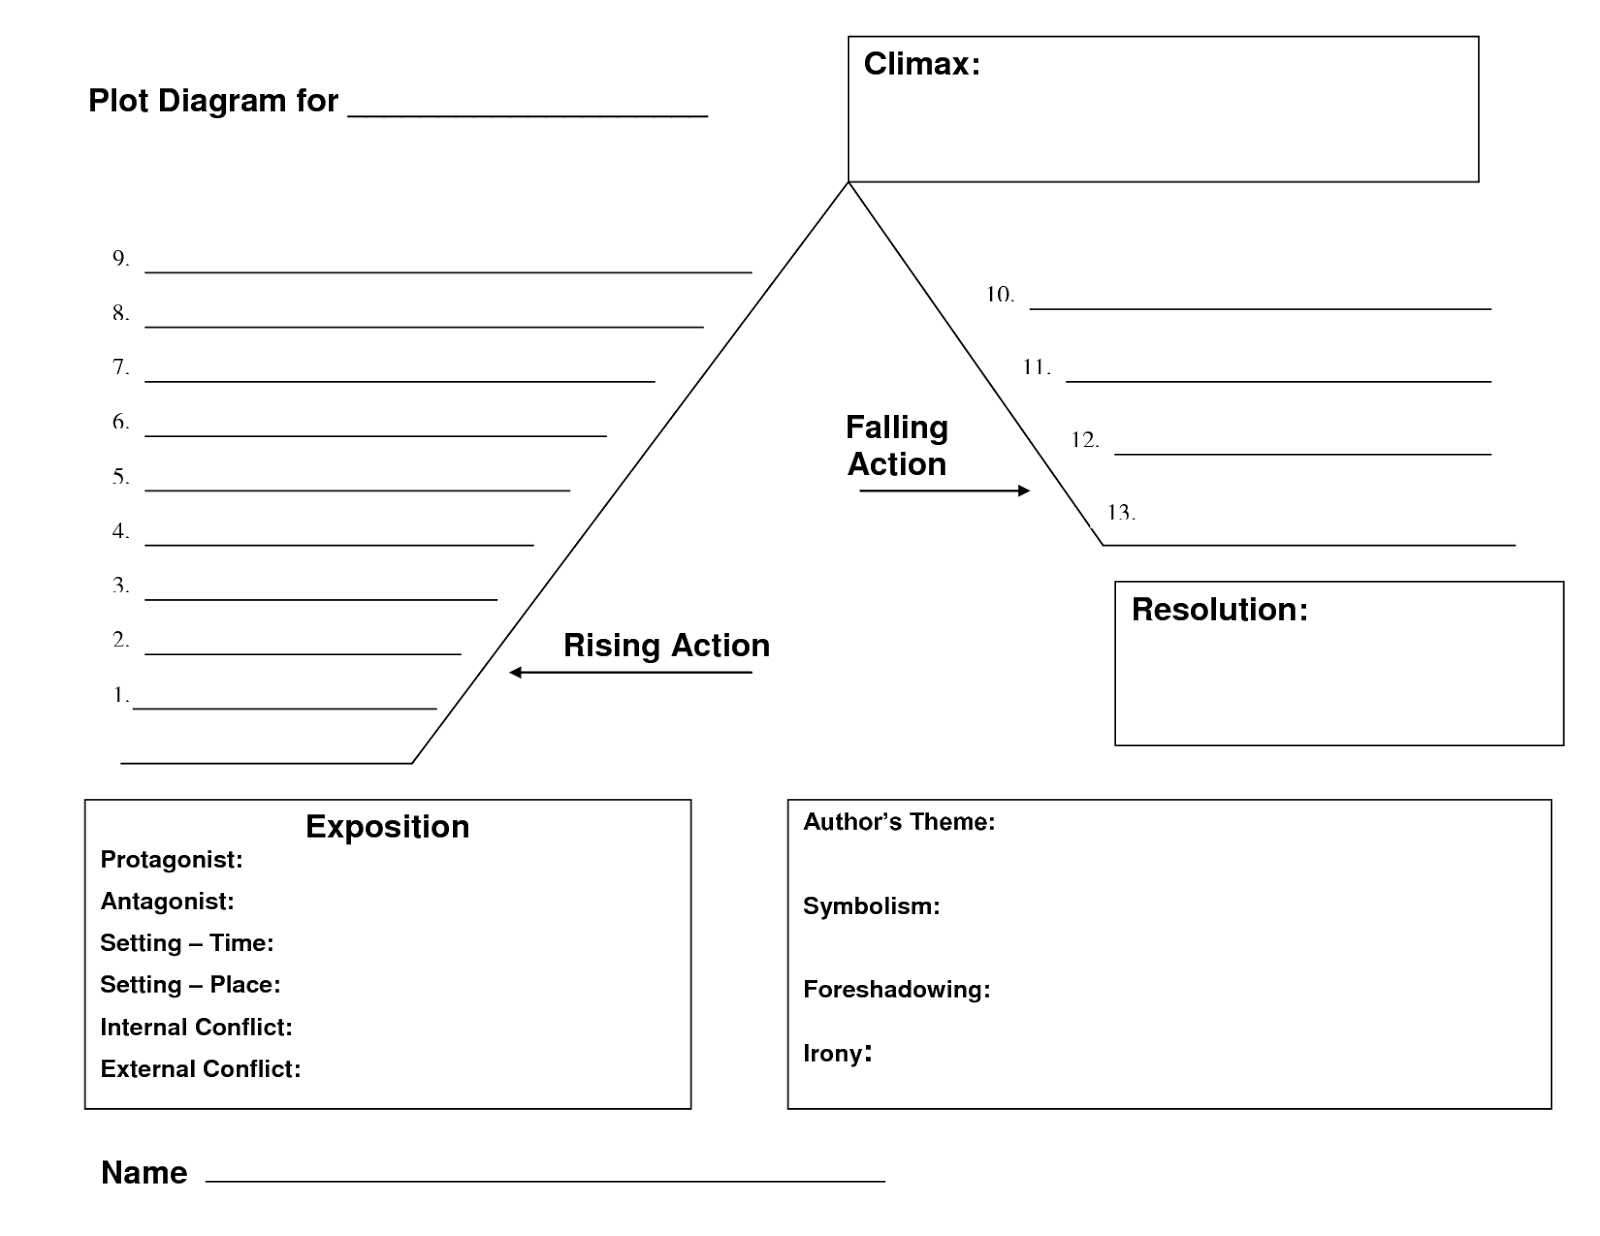 di croce st simon dec 18 novel study plot diagram prezi. Black Bedroom Furniture Sets. Home Design Ideas